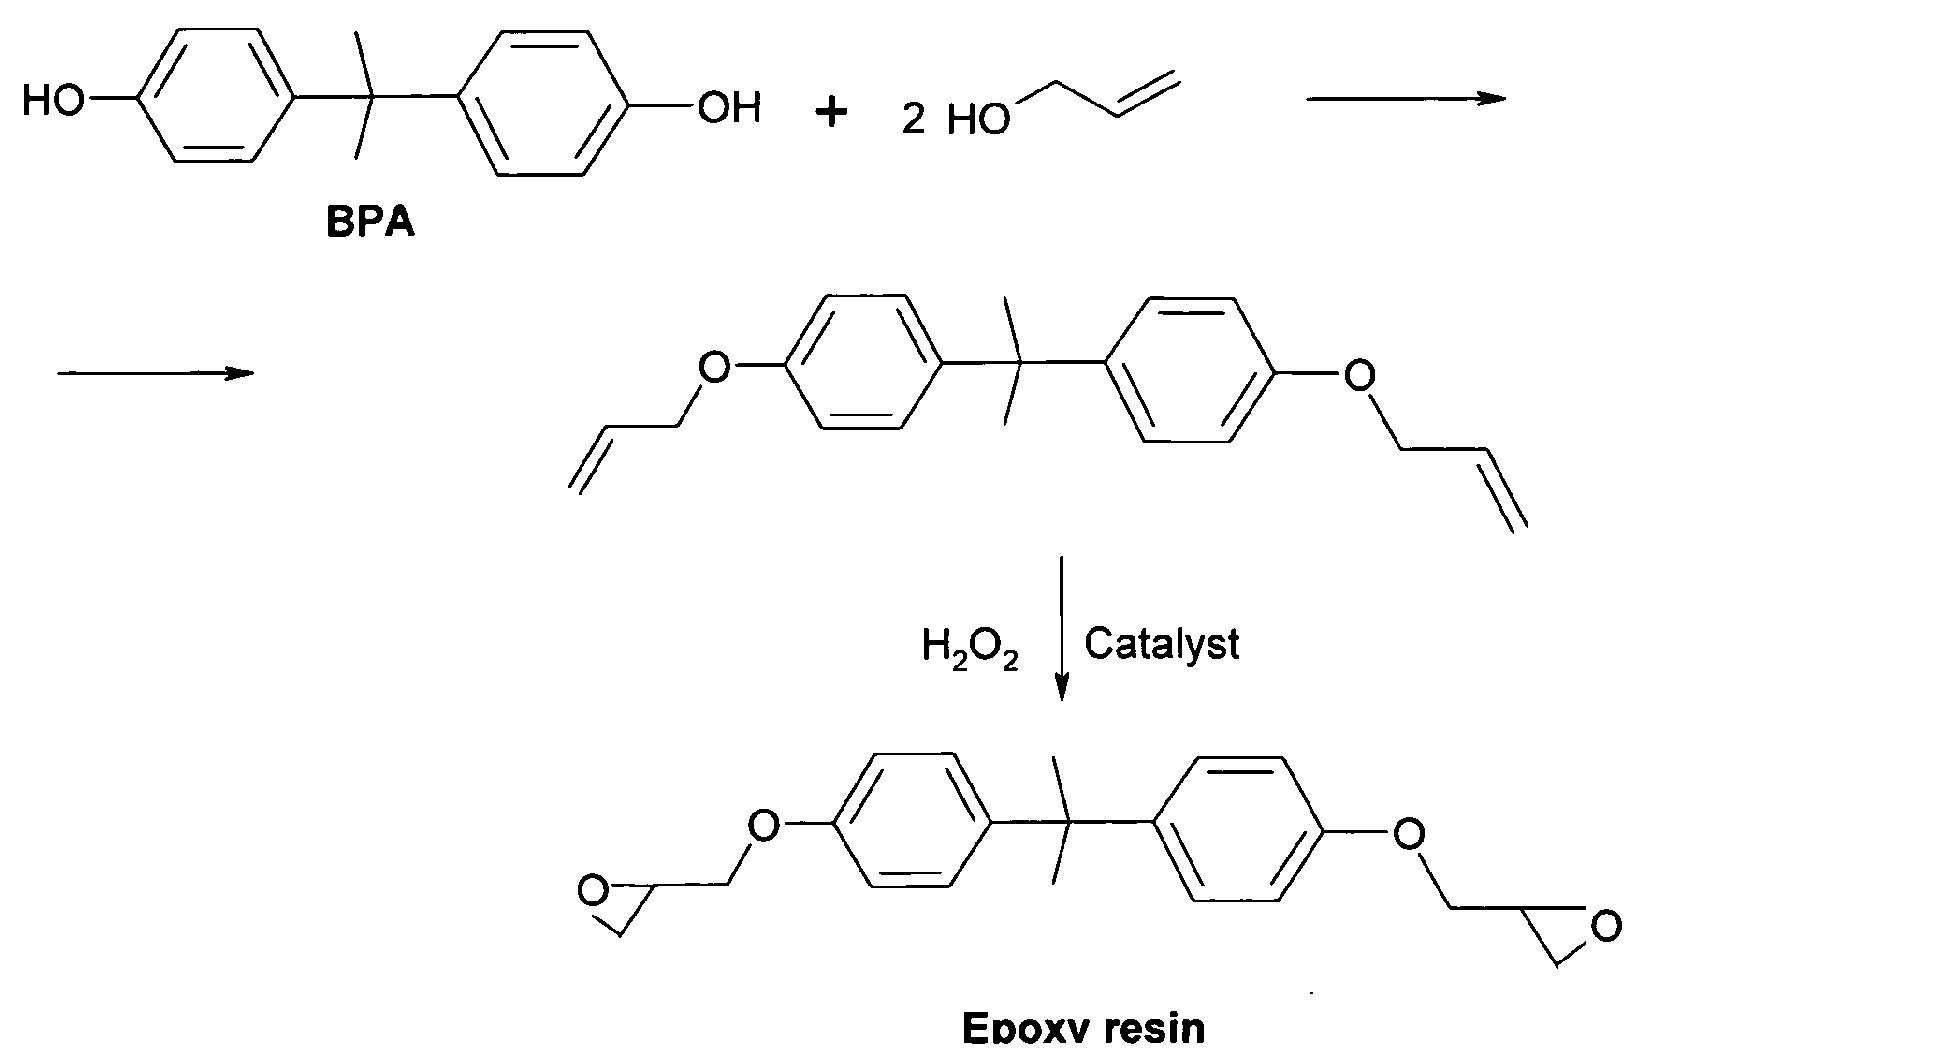 Ep2357180a1 Manufacture Of Epoxyethyl Ethers Or Glycidyl